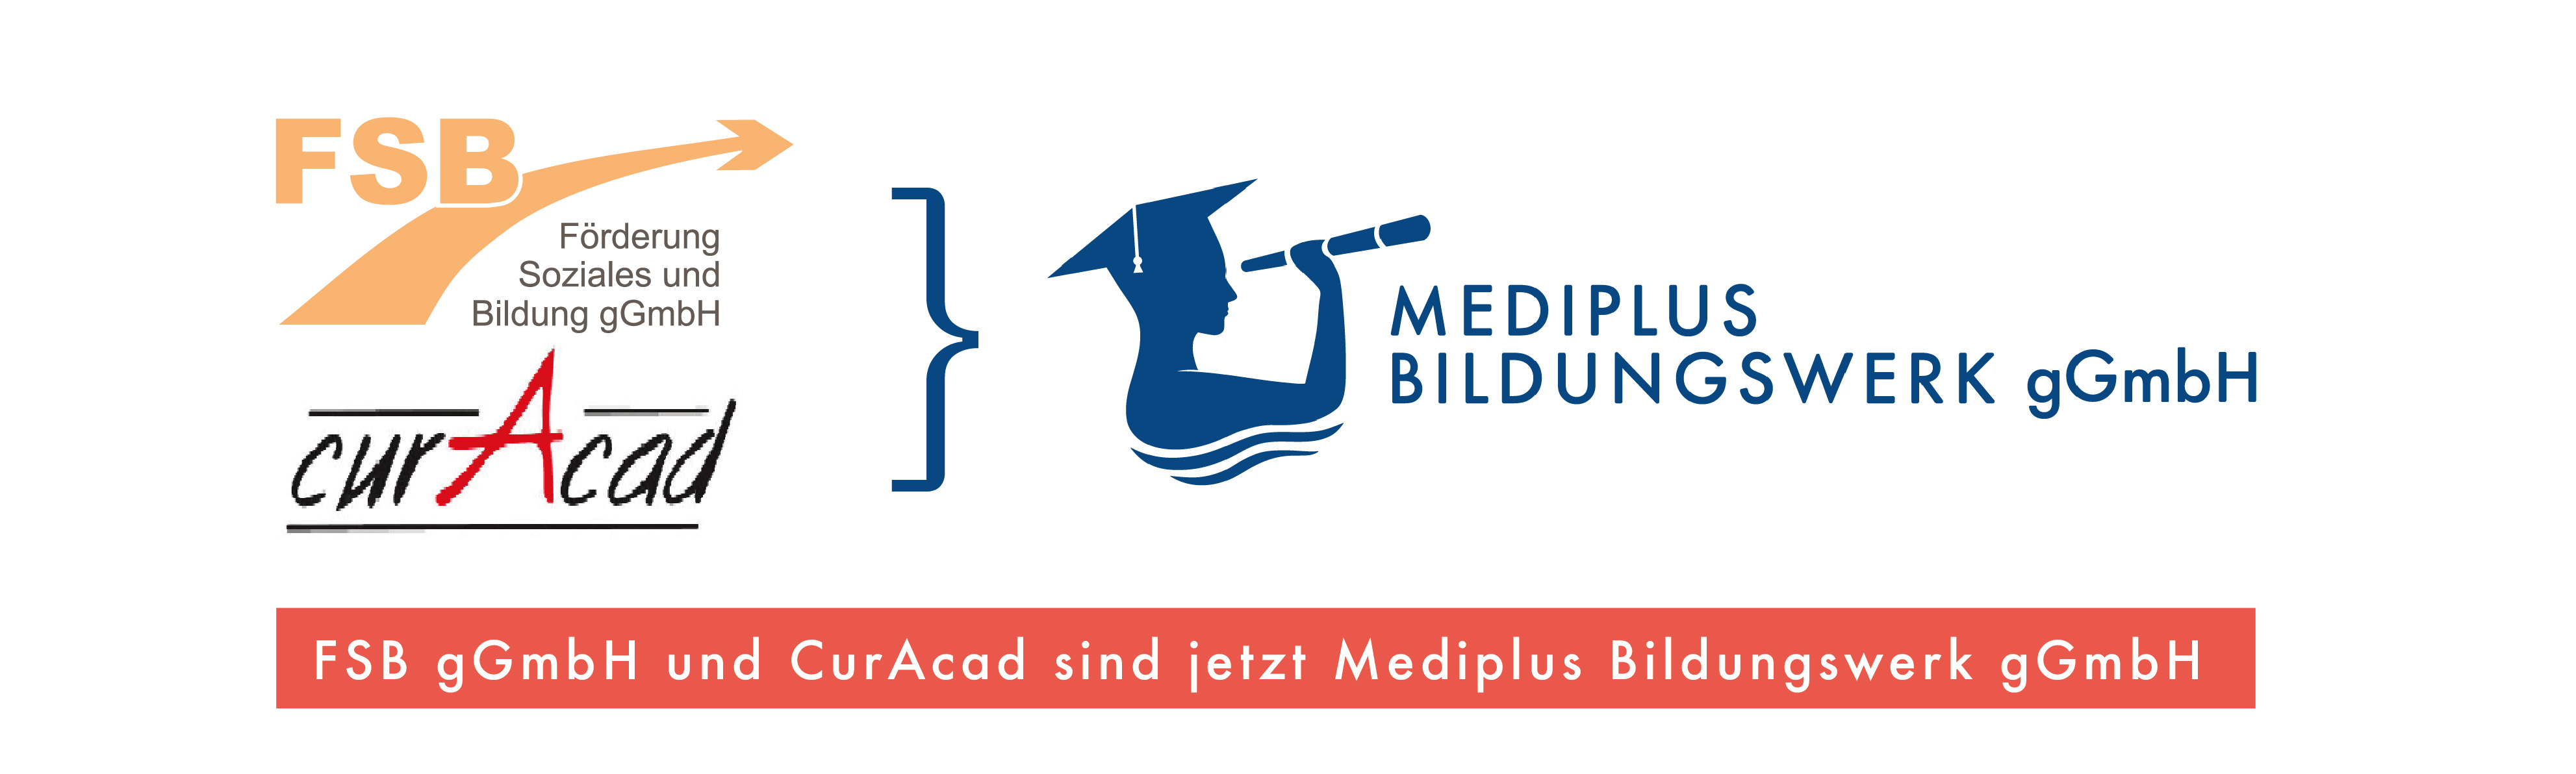 Mediplus Bildungswerk gGmbH